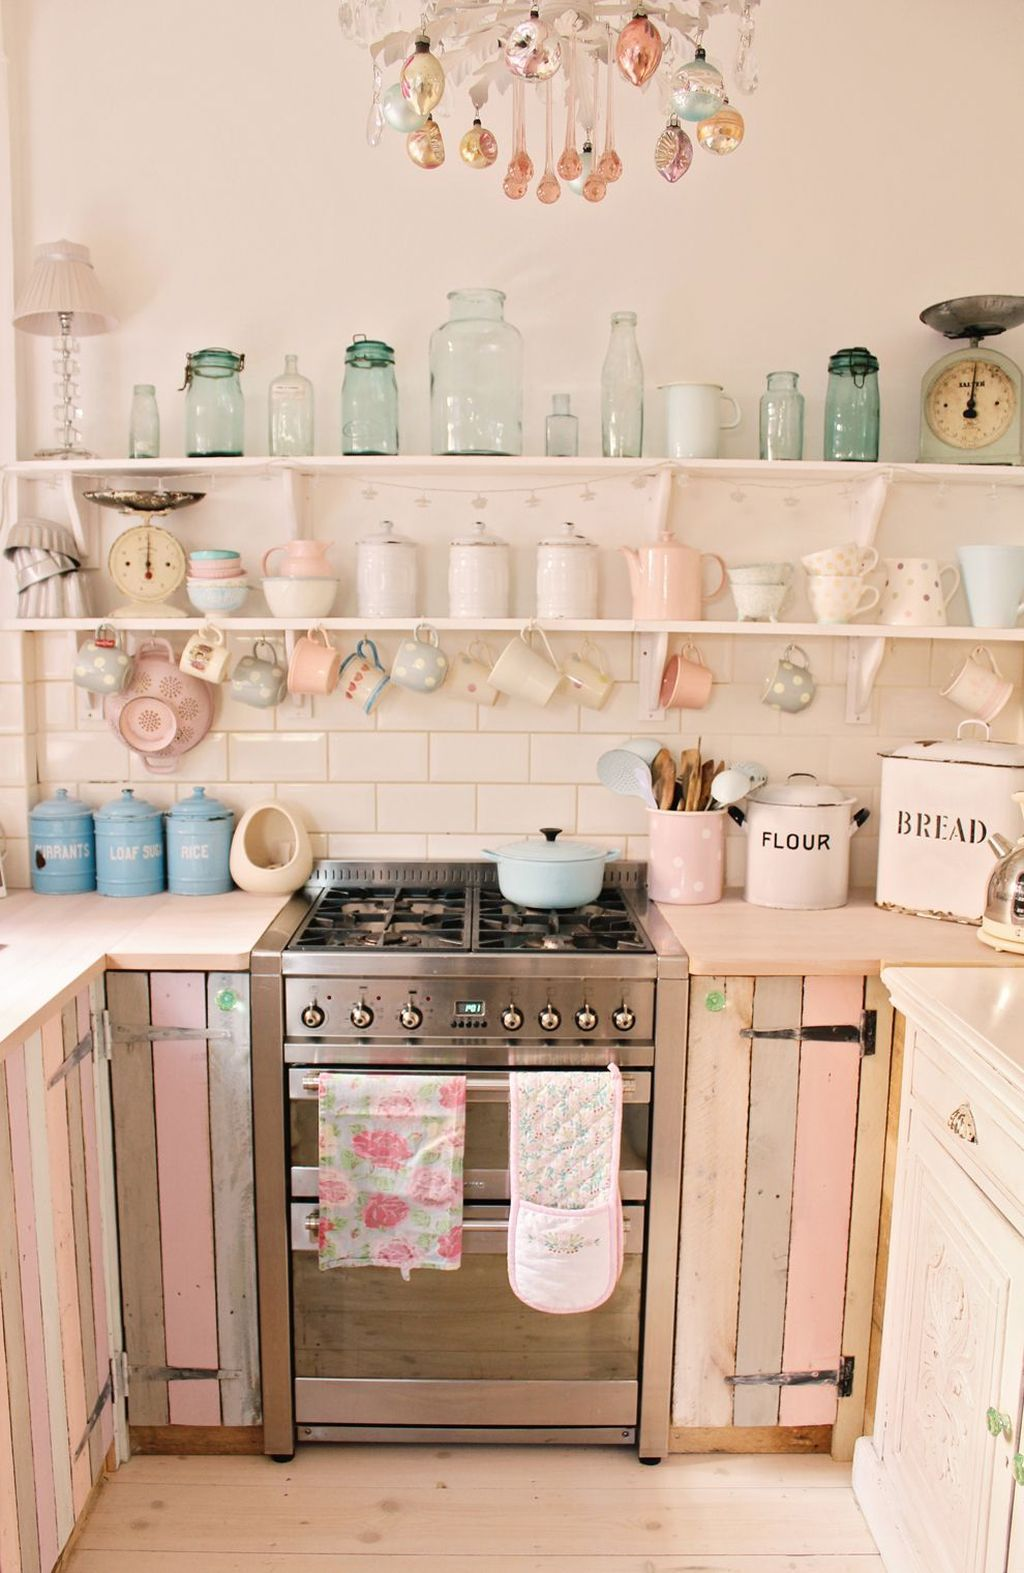 Idee Per La Cucina 34 beautiful vintage kitchen decorations ideas to make a